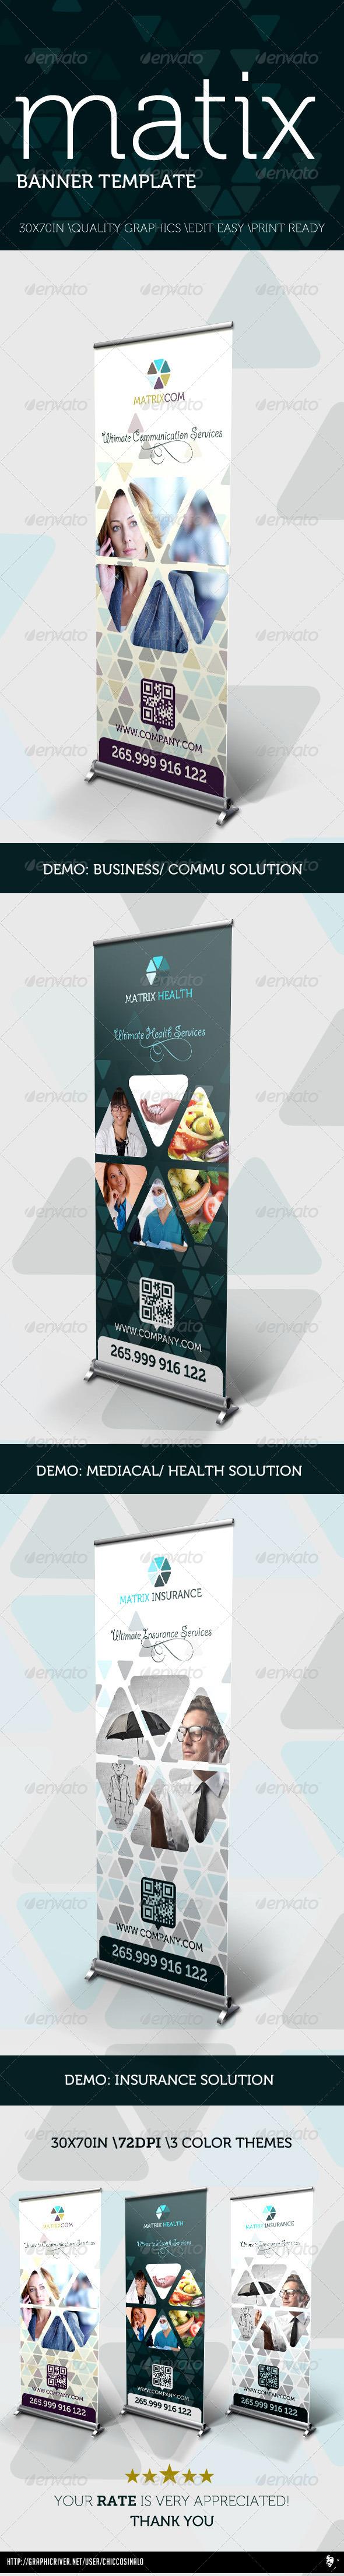 Matrix Banner Template - Signage Print Templates